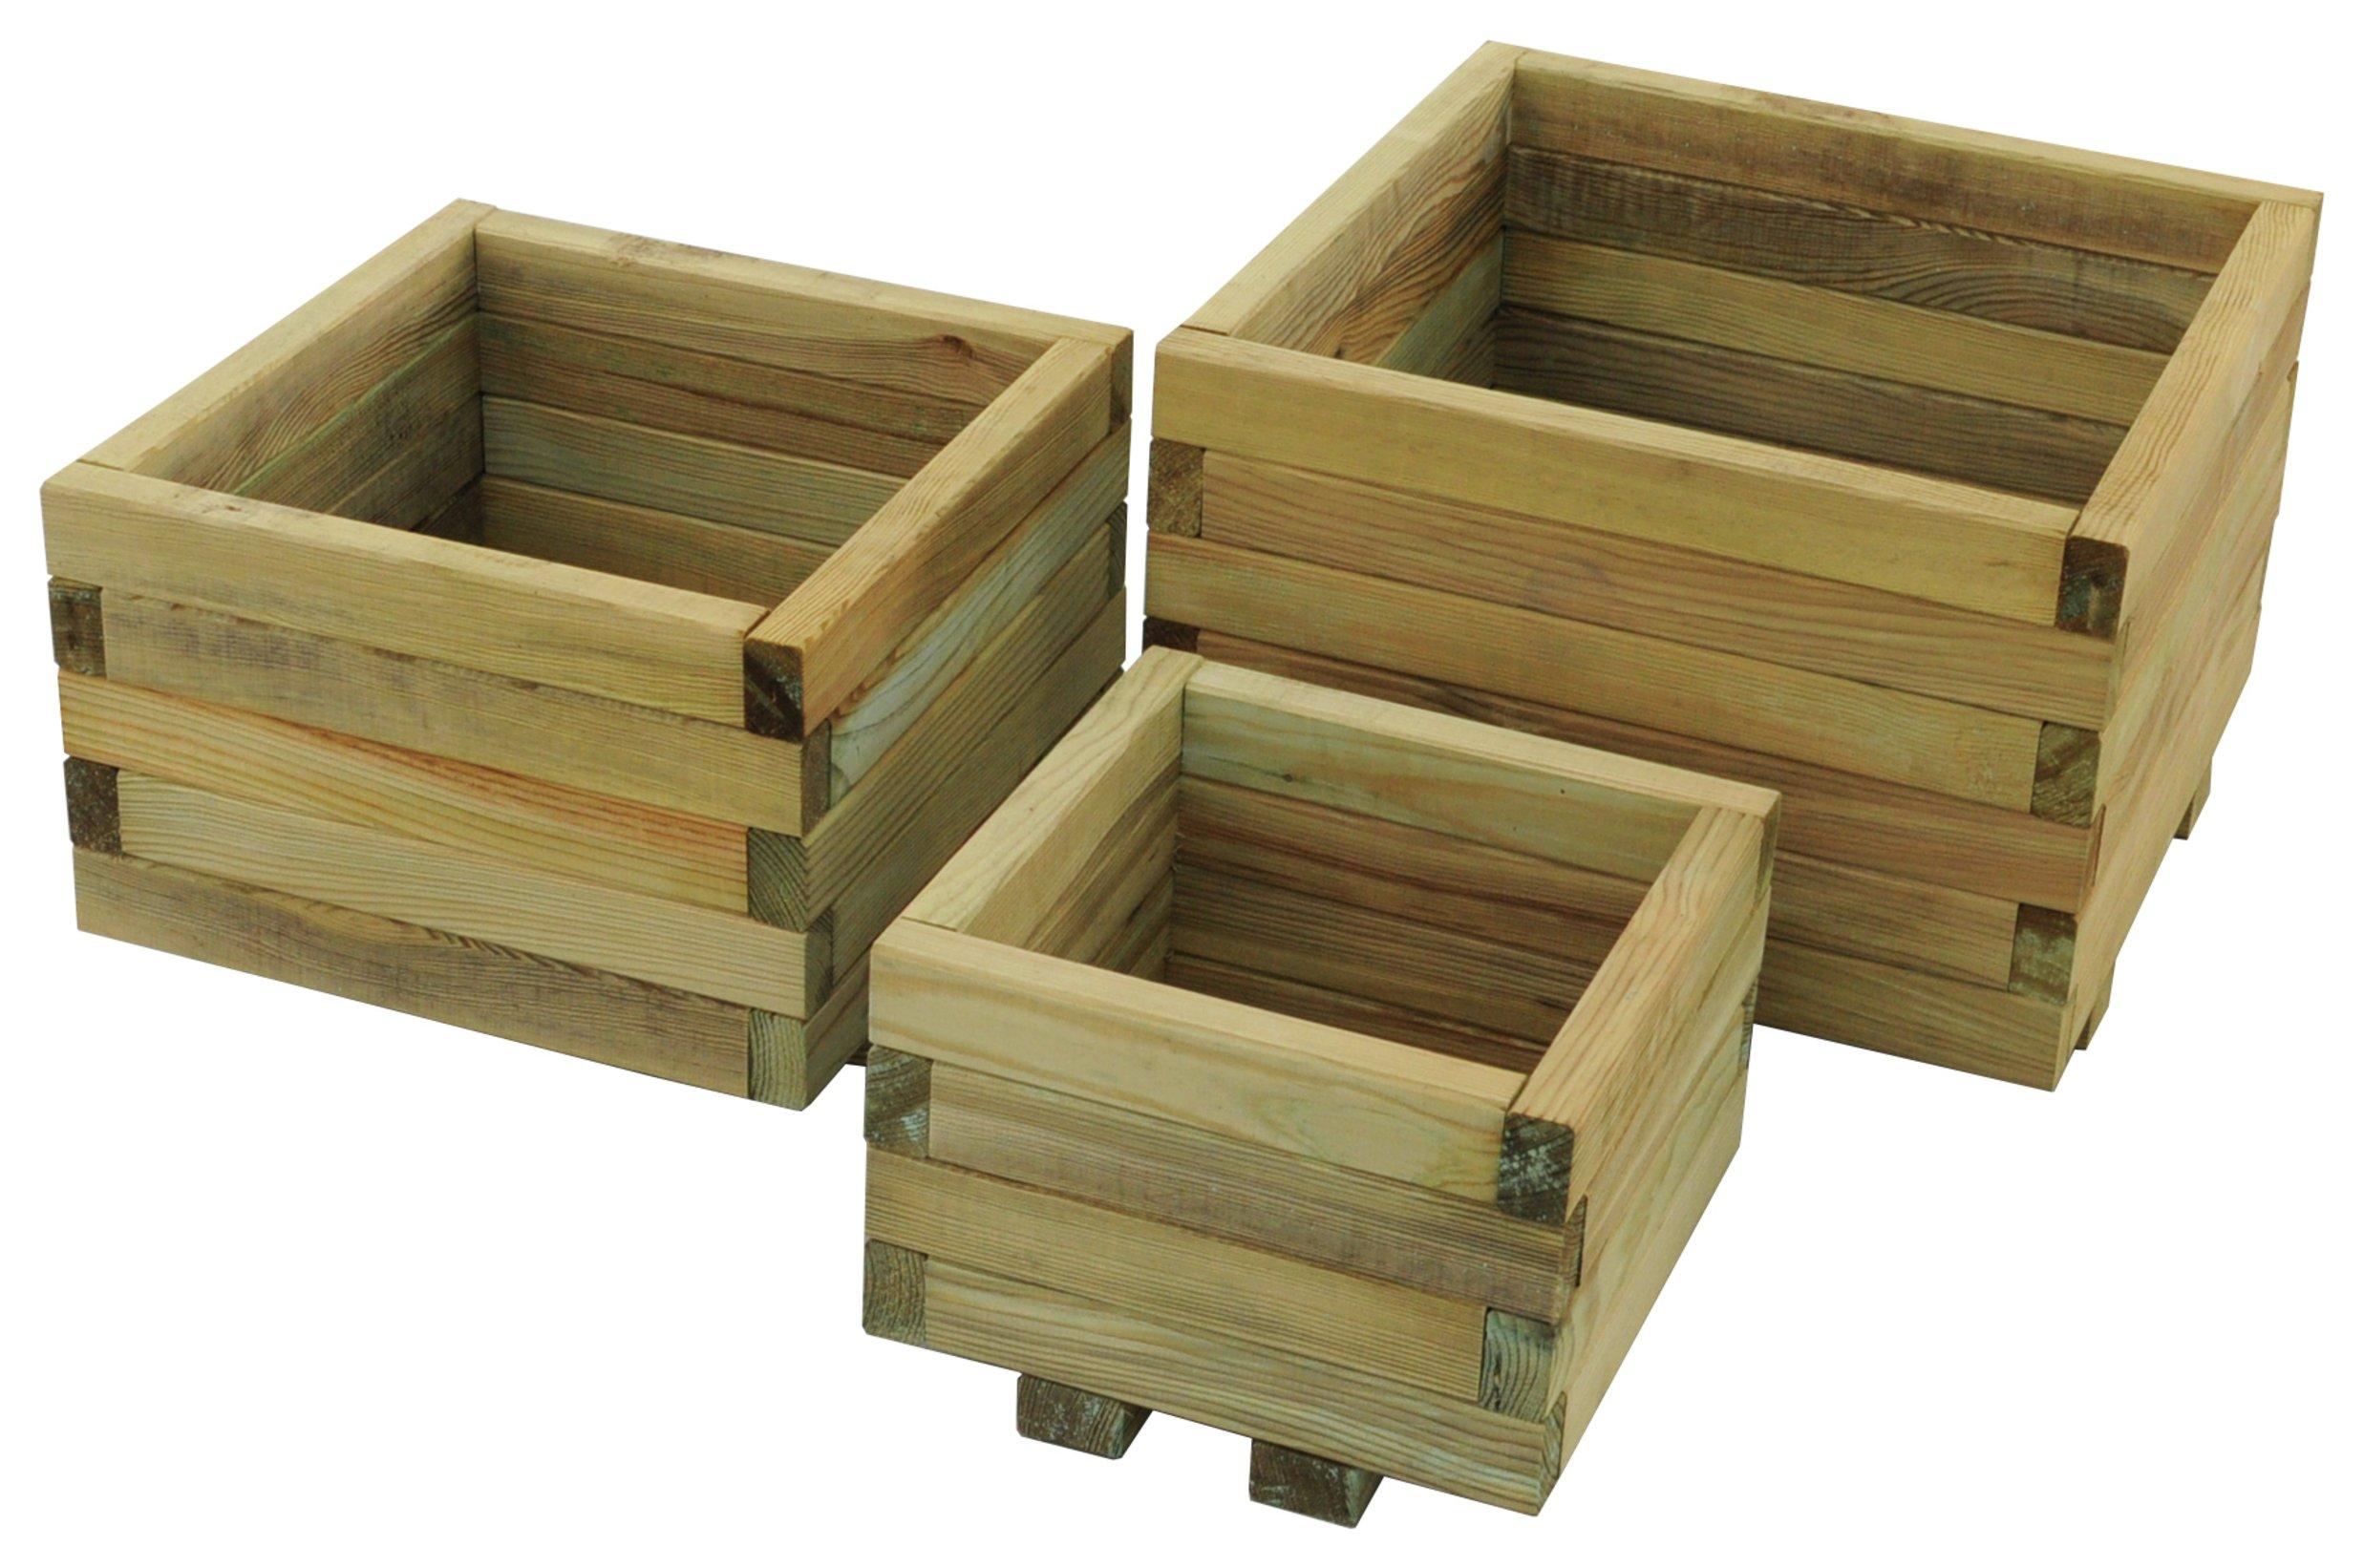 Image of Forest Kendal Sqaure Planter - Set of 3